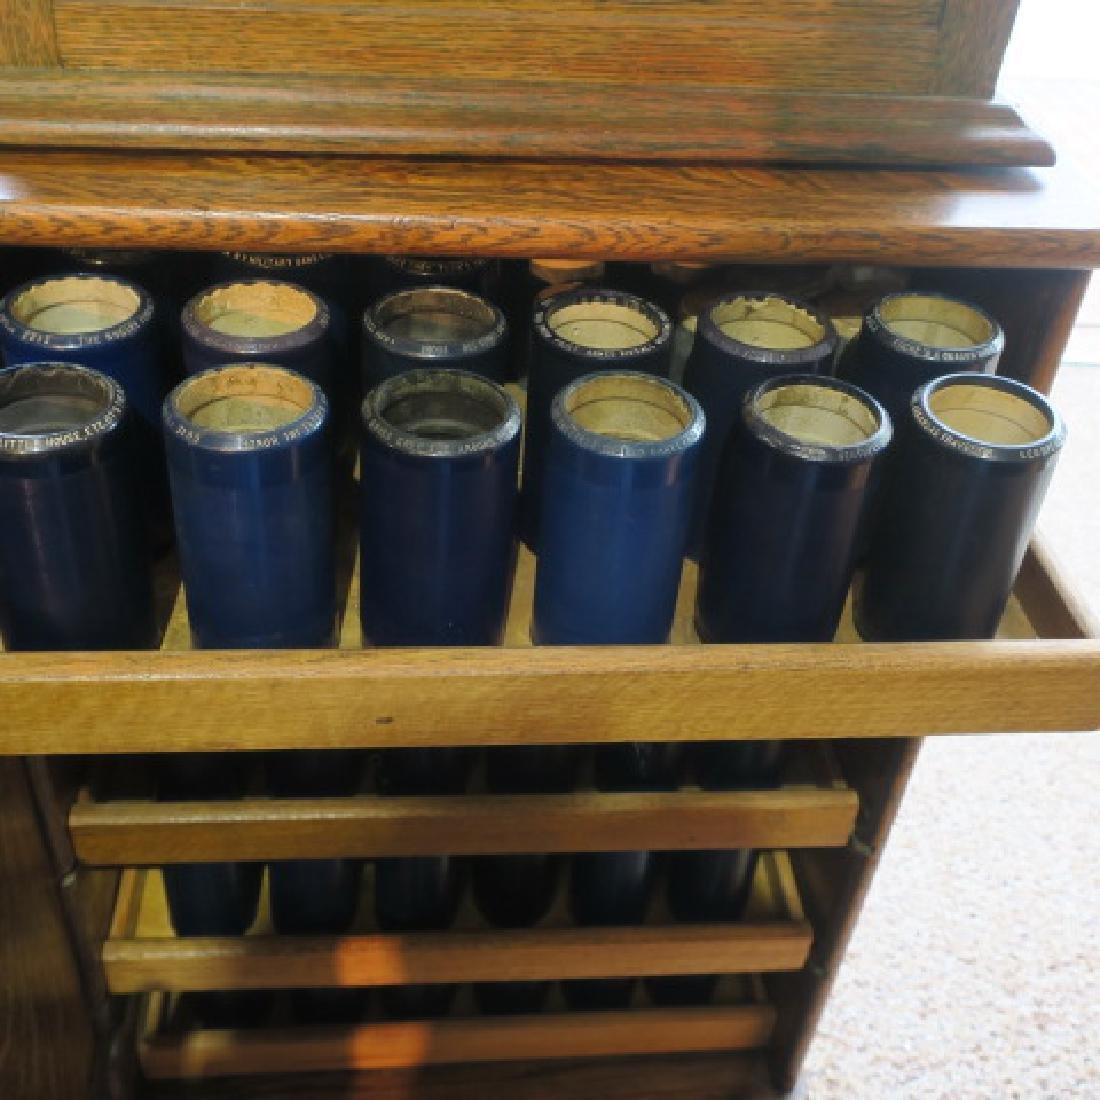 Tiger Oak Music Cabinet w/119 Edison Wax Cylinders: - 2